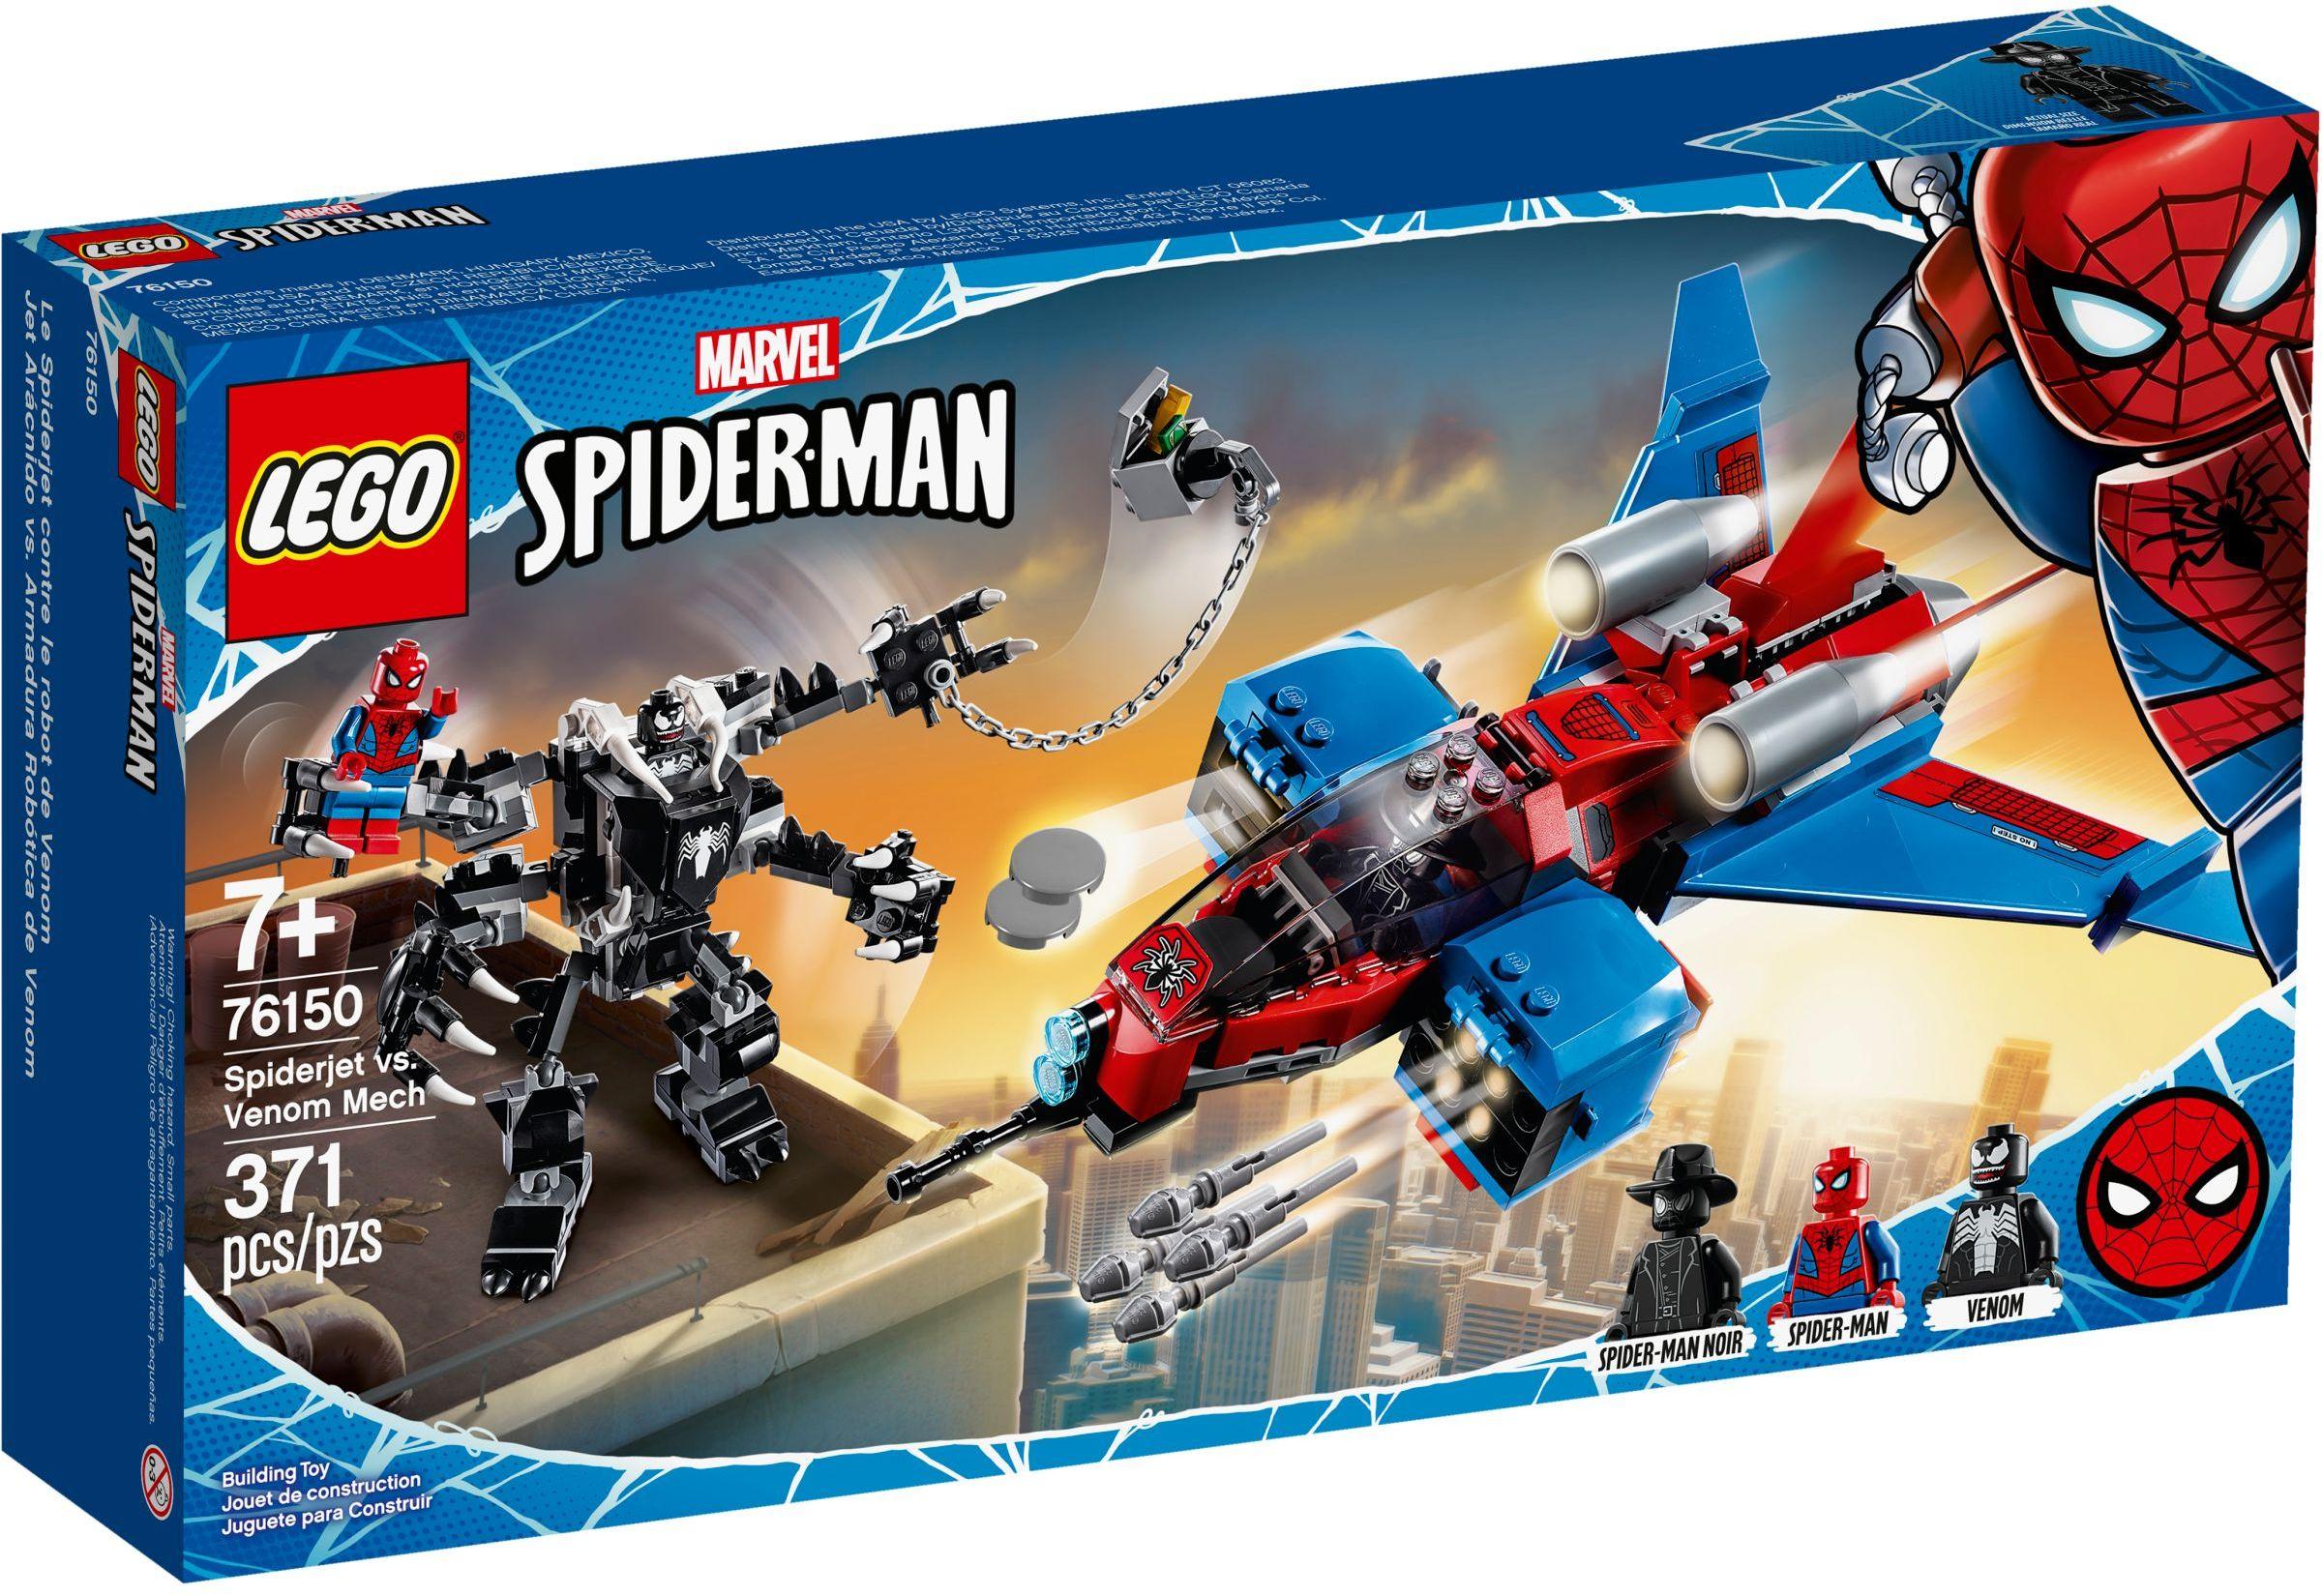 76150 Spider-Jet vs. Venom Mech